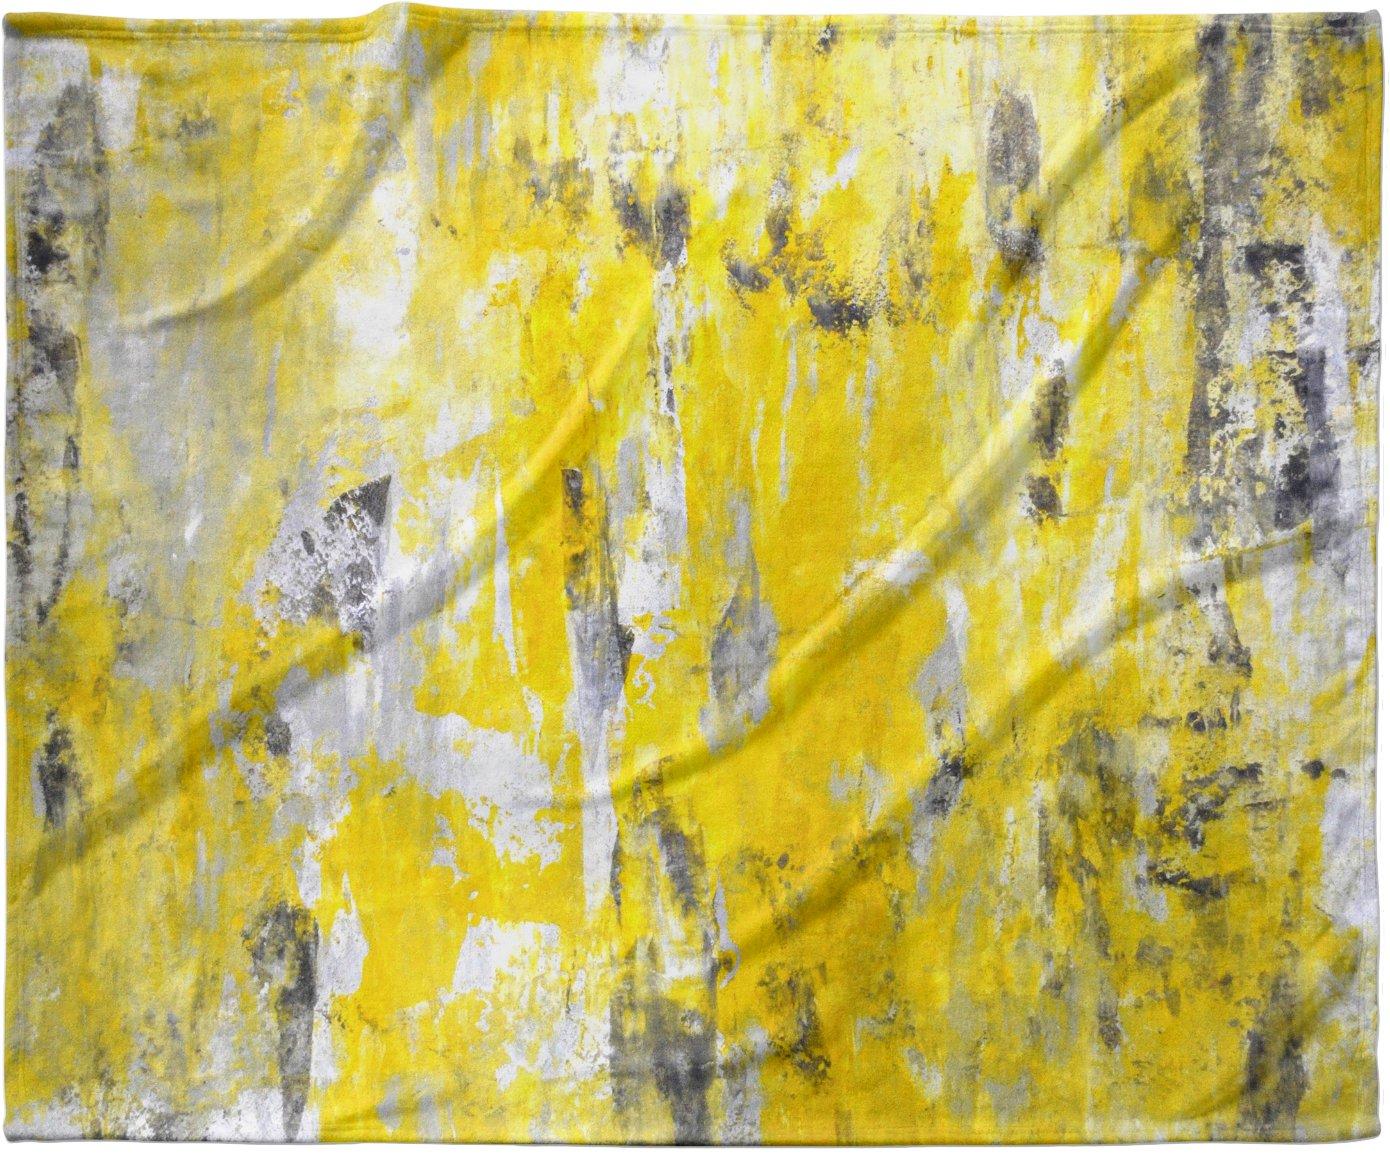 KESS InHouse CarolLynn Tice 'Picking Around' Yellow Fleece Baby Blanket, 40' x 30'